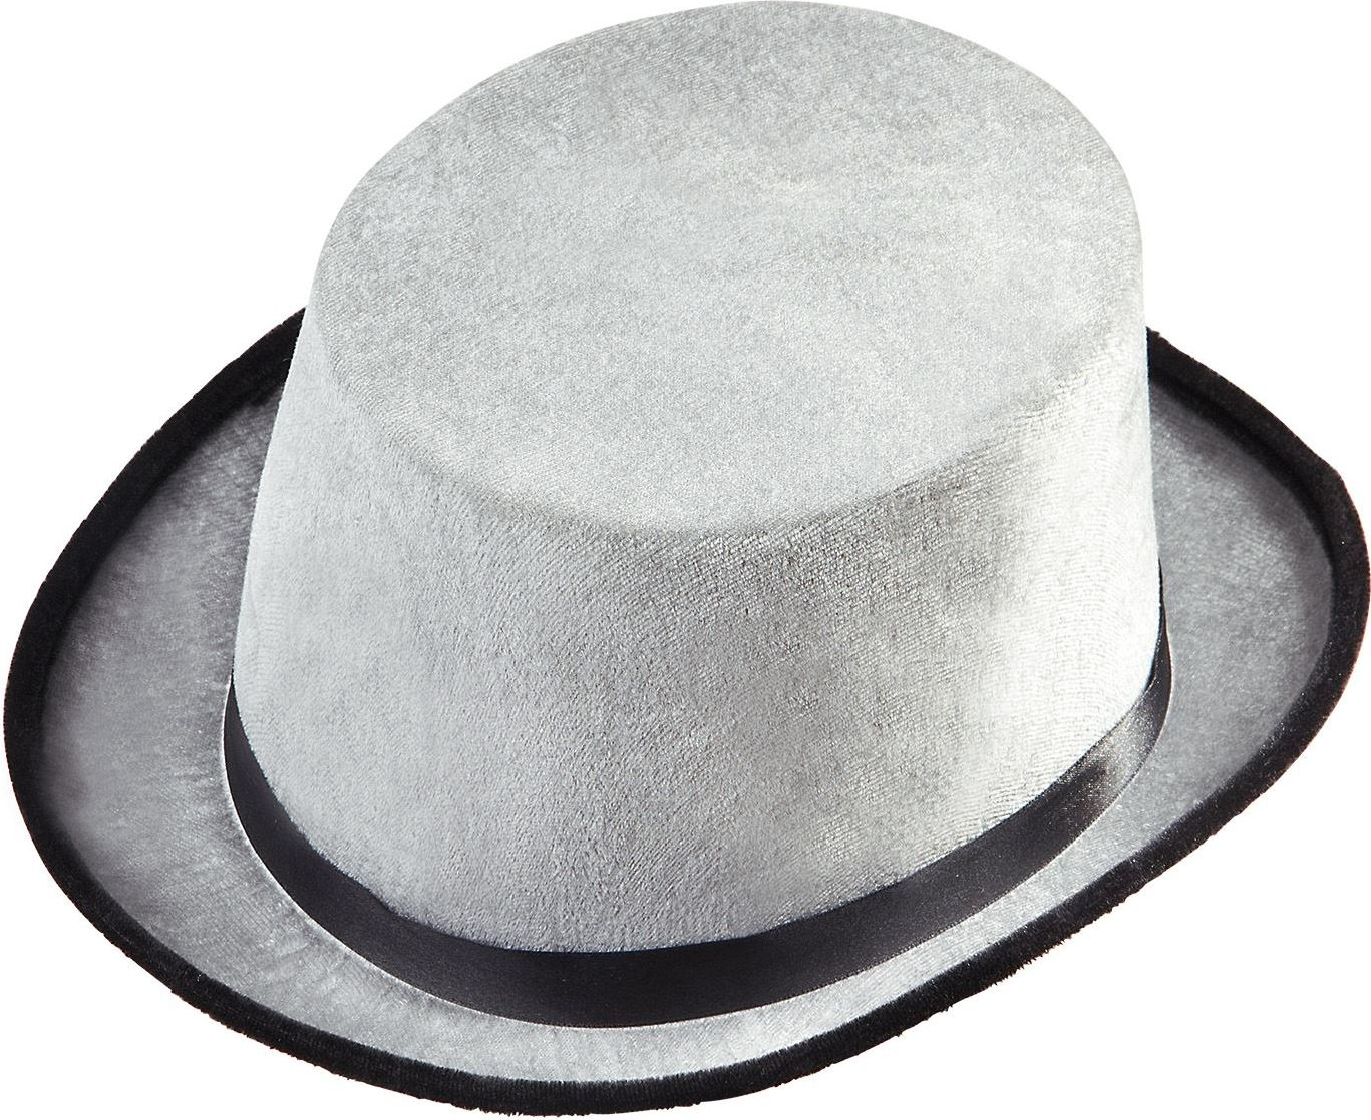 Fluwelen hoge hoed grijs